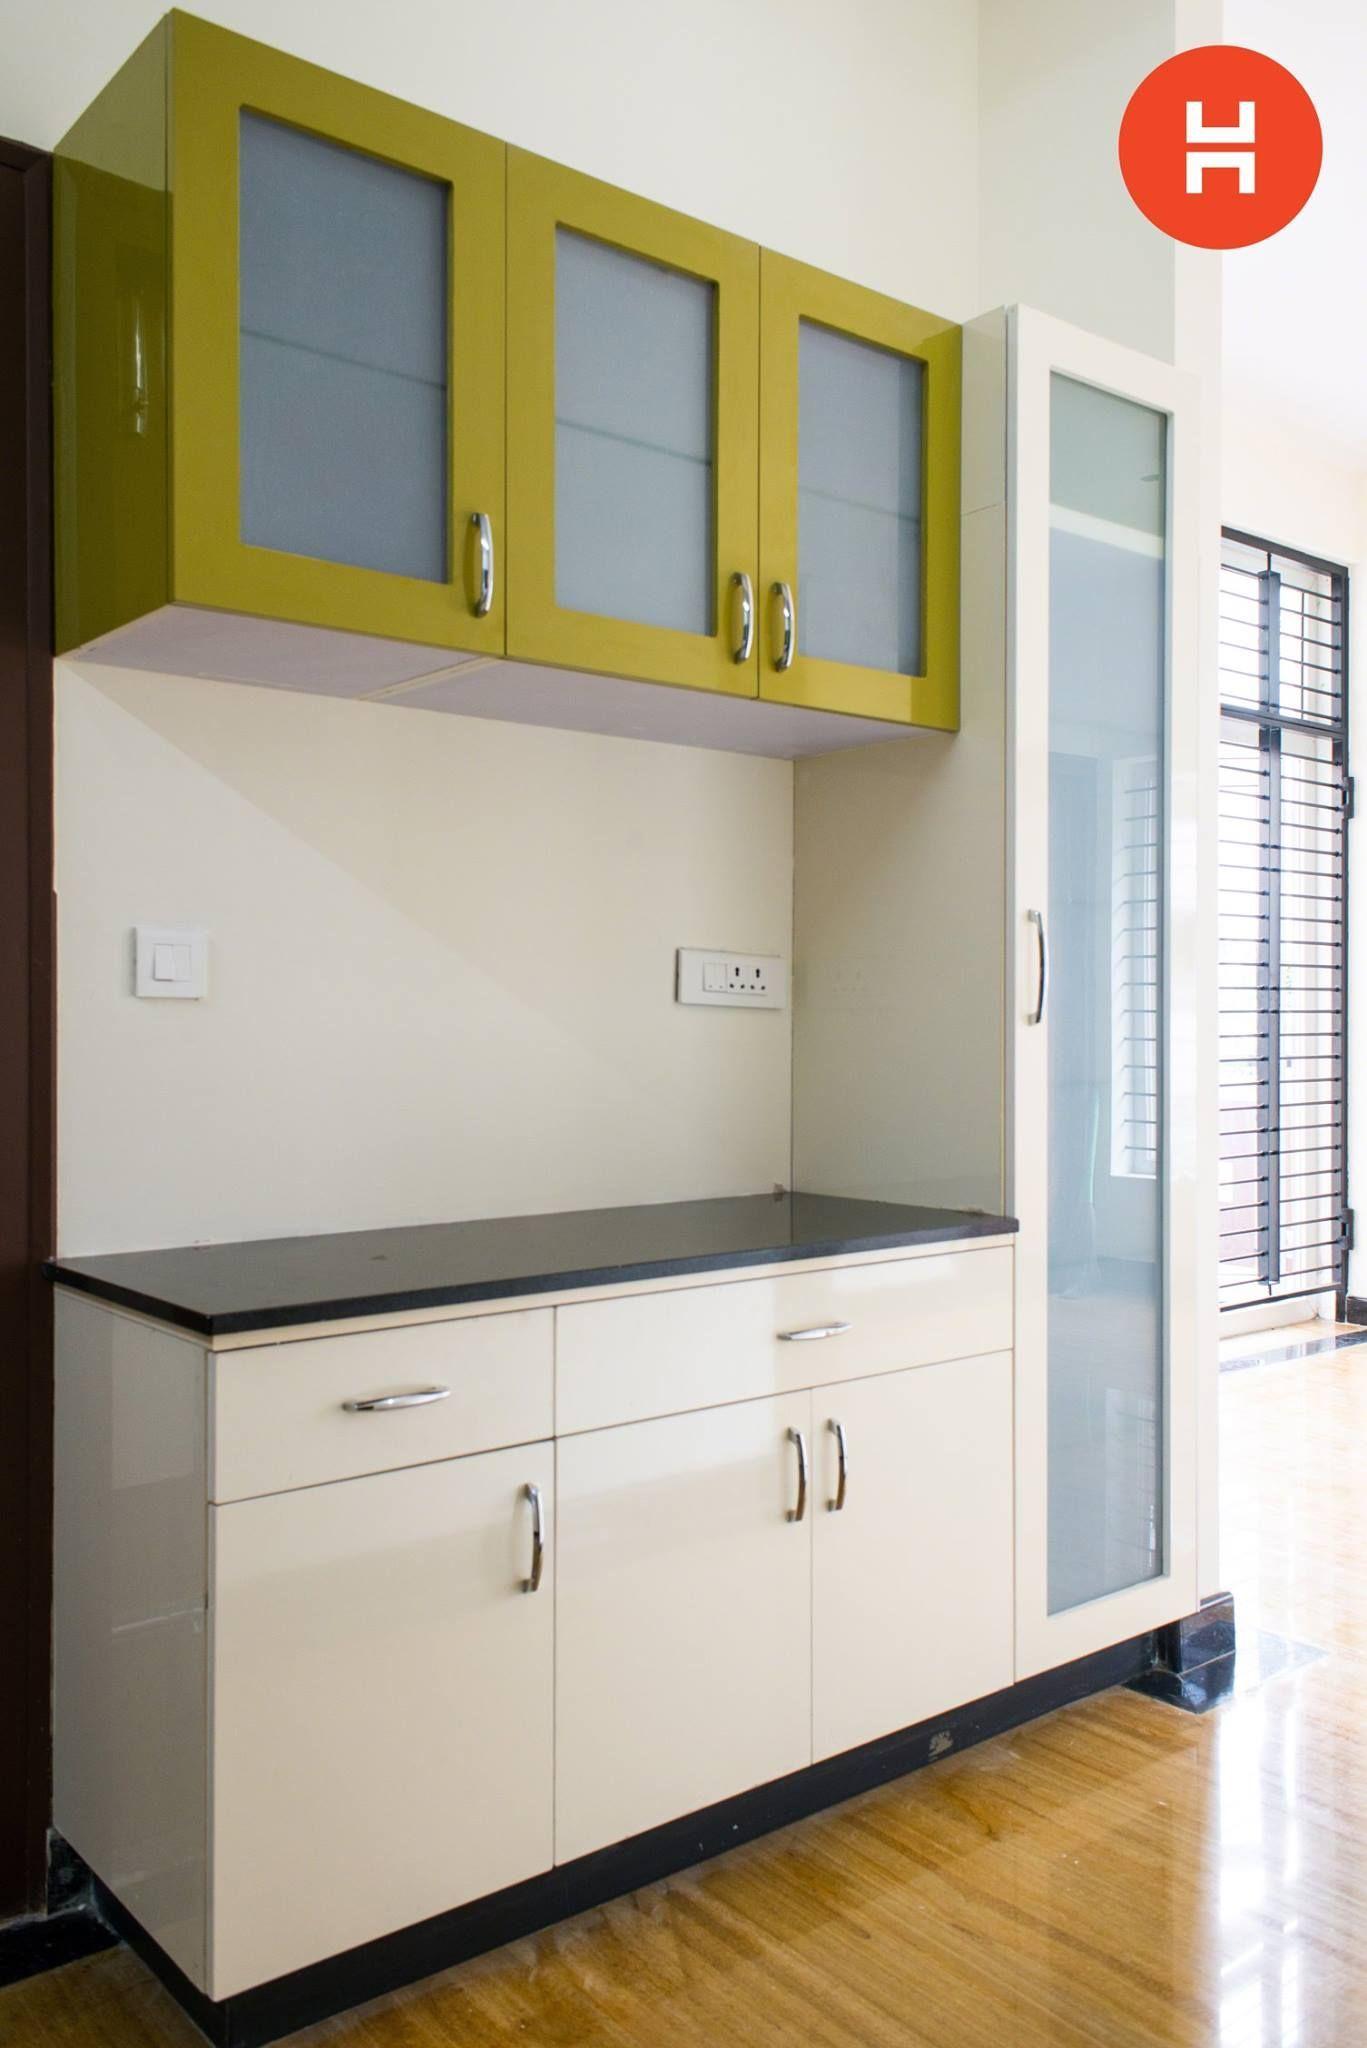 Side Cabin In The Kitchen Kitchen Room Design Cupboard Design Kitchen Cupboard Designs